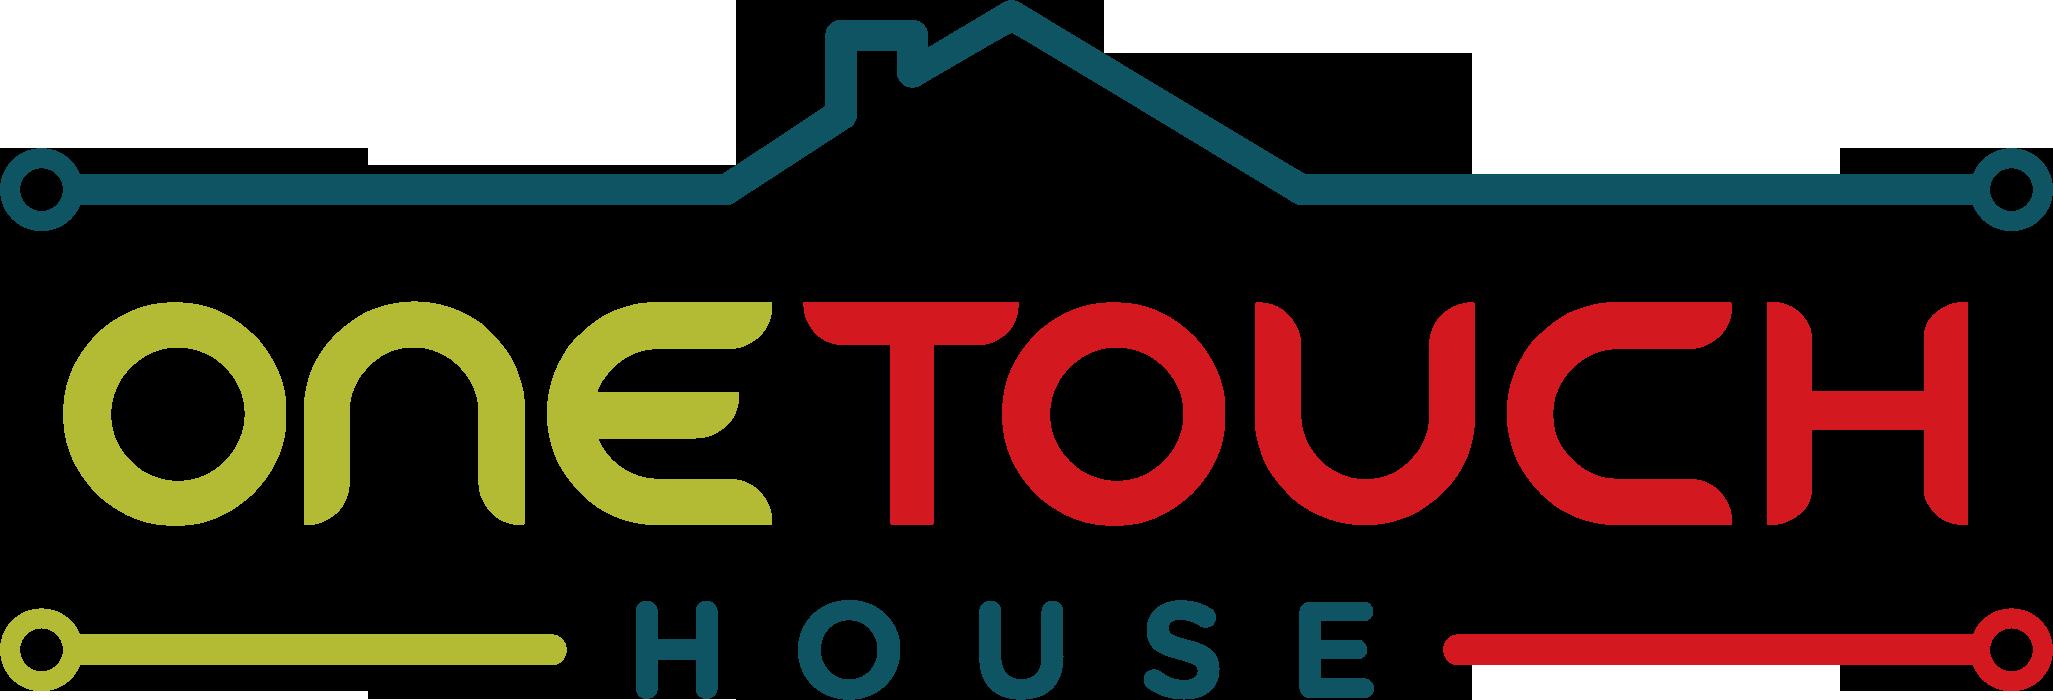 onetouch house logo